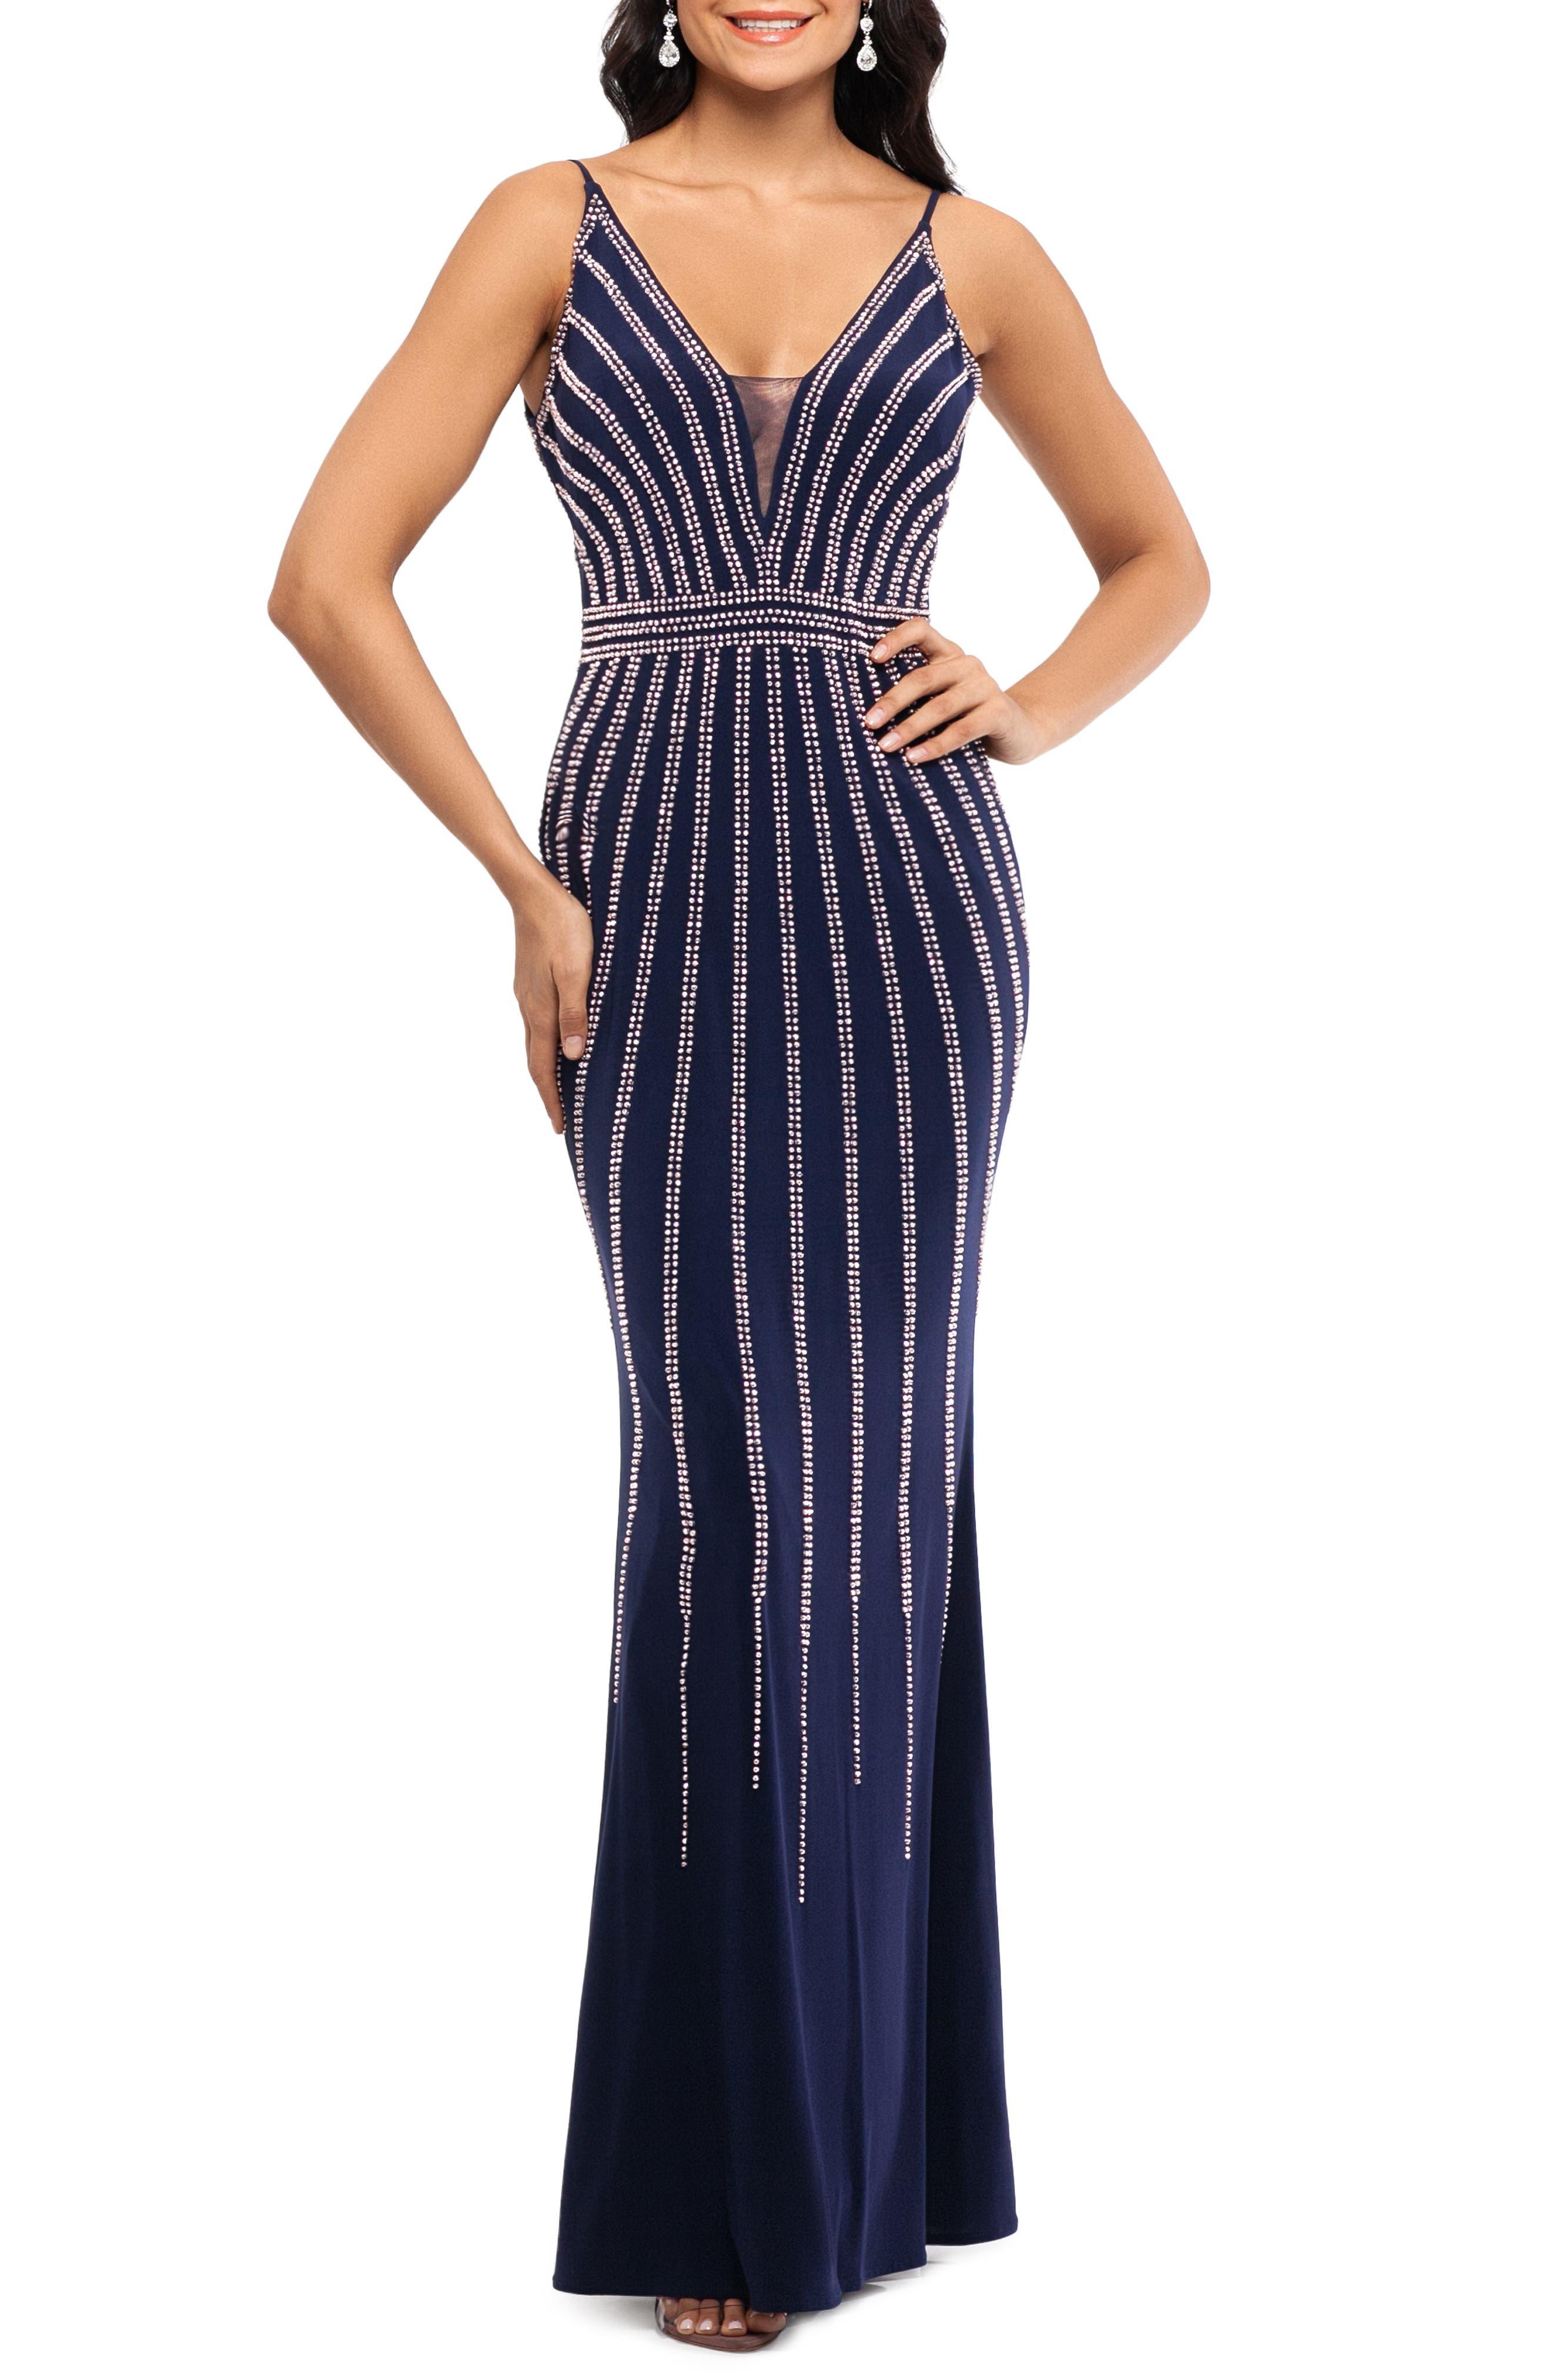 Xscape Beaded Evening Dress, Blue